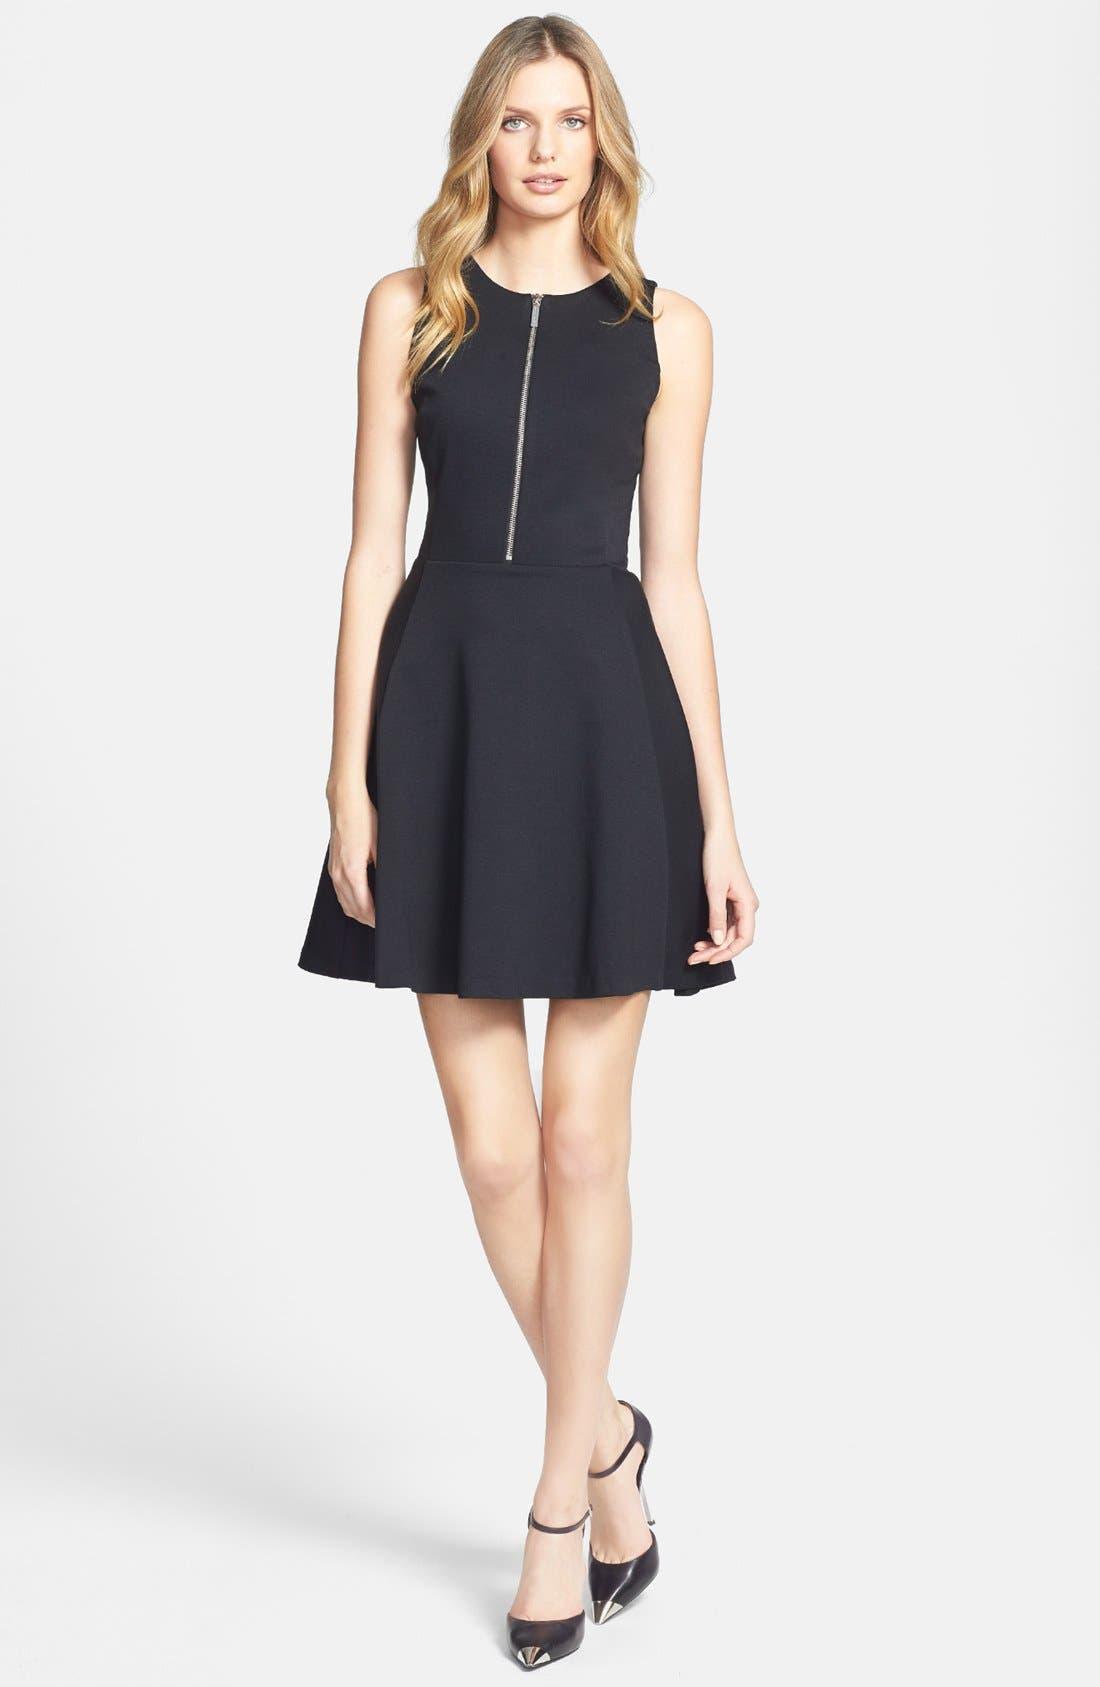 Alternate Image 1 Selected - MICHAEL Michael Kors Zip Front Fit & Flare Dress